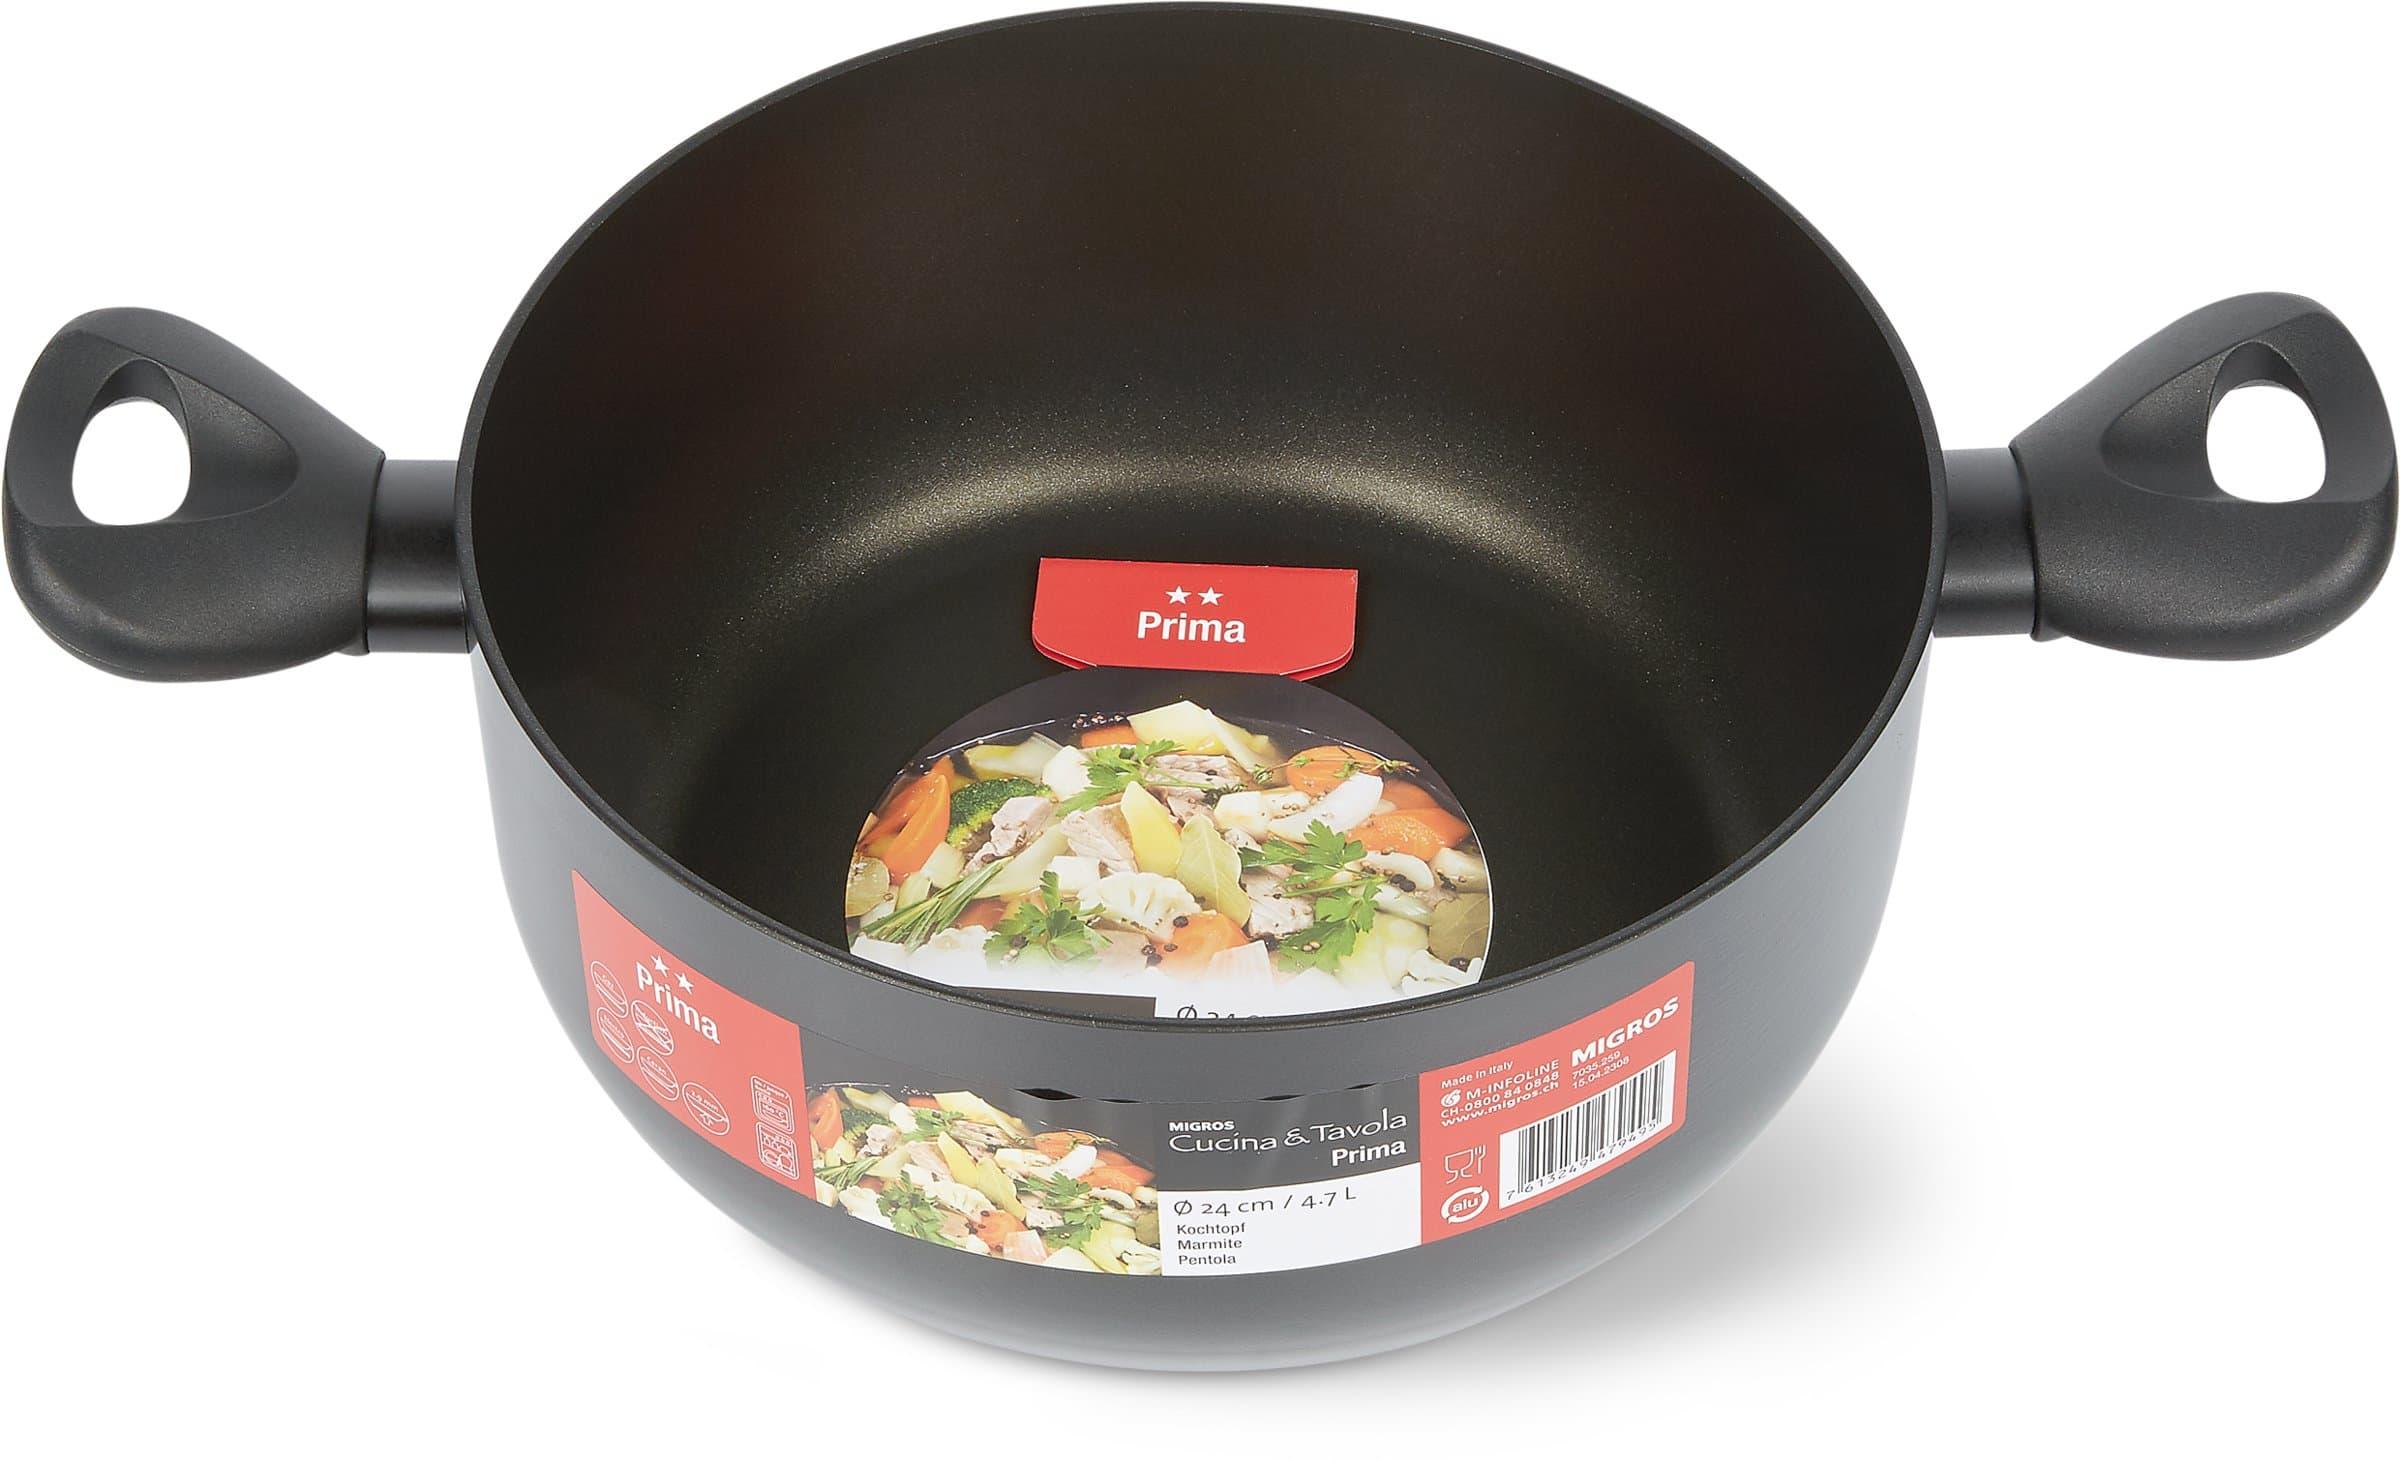 Cucina & Tavola PRIMA Kochtopf